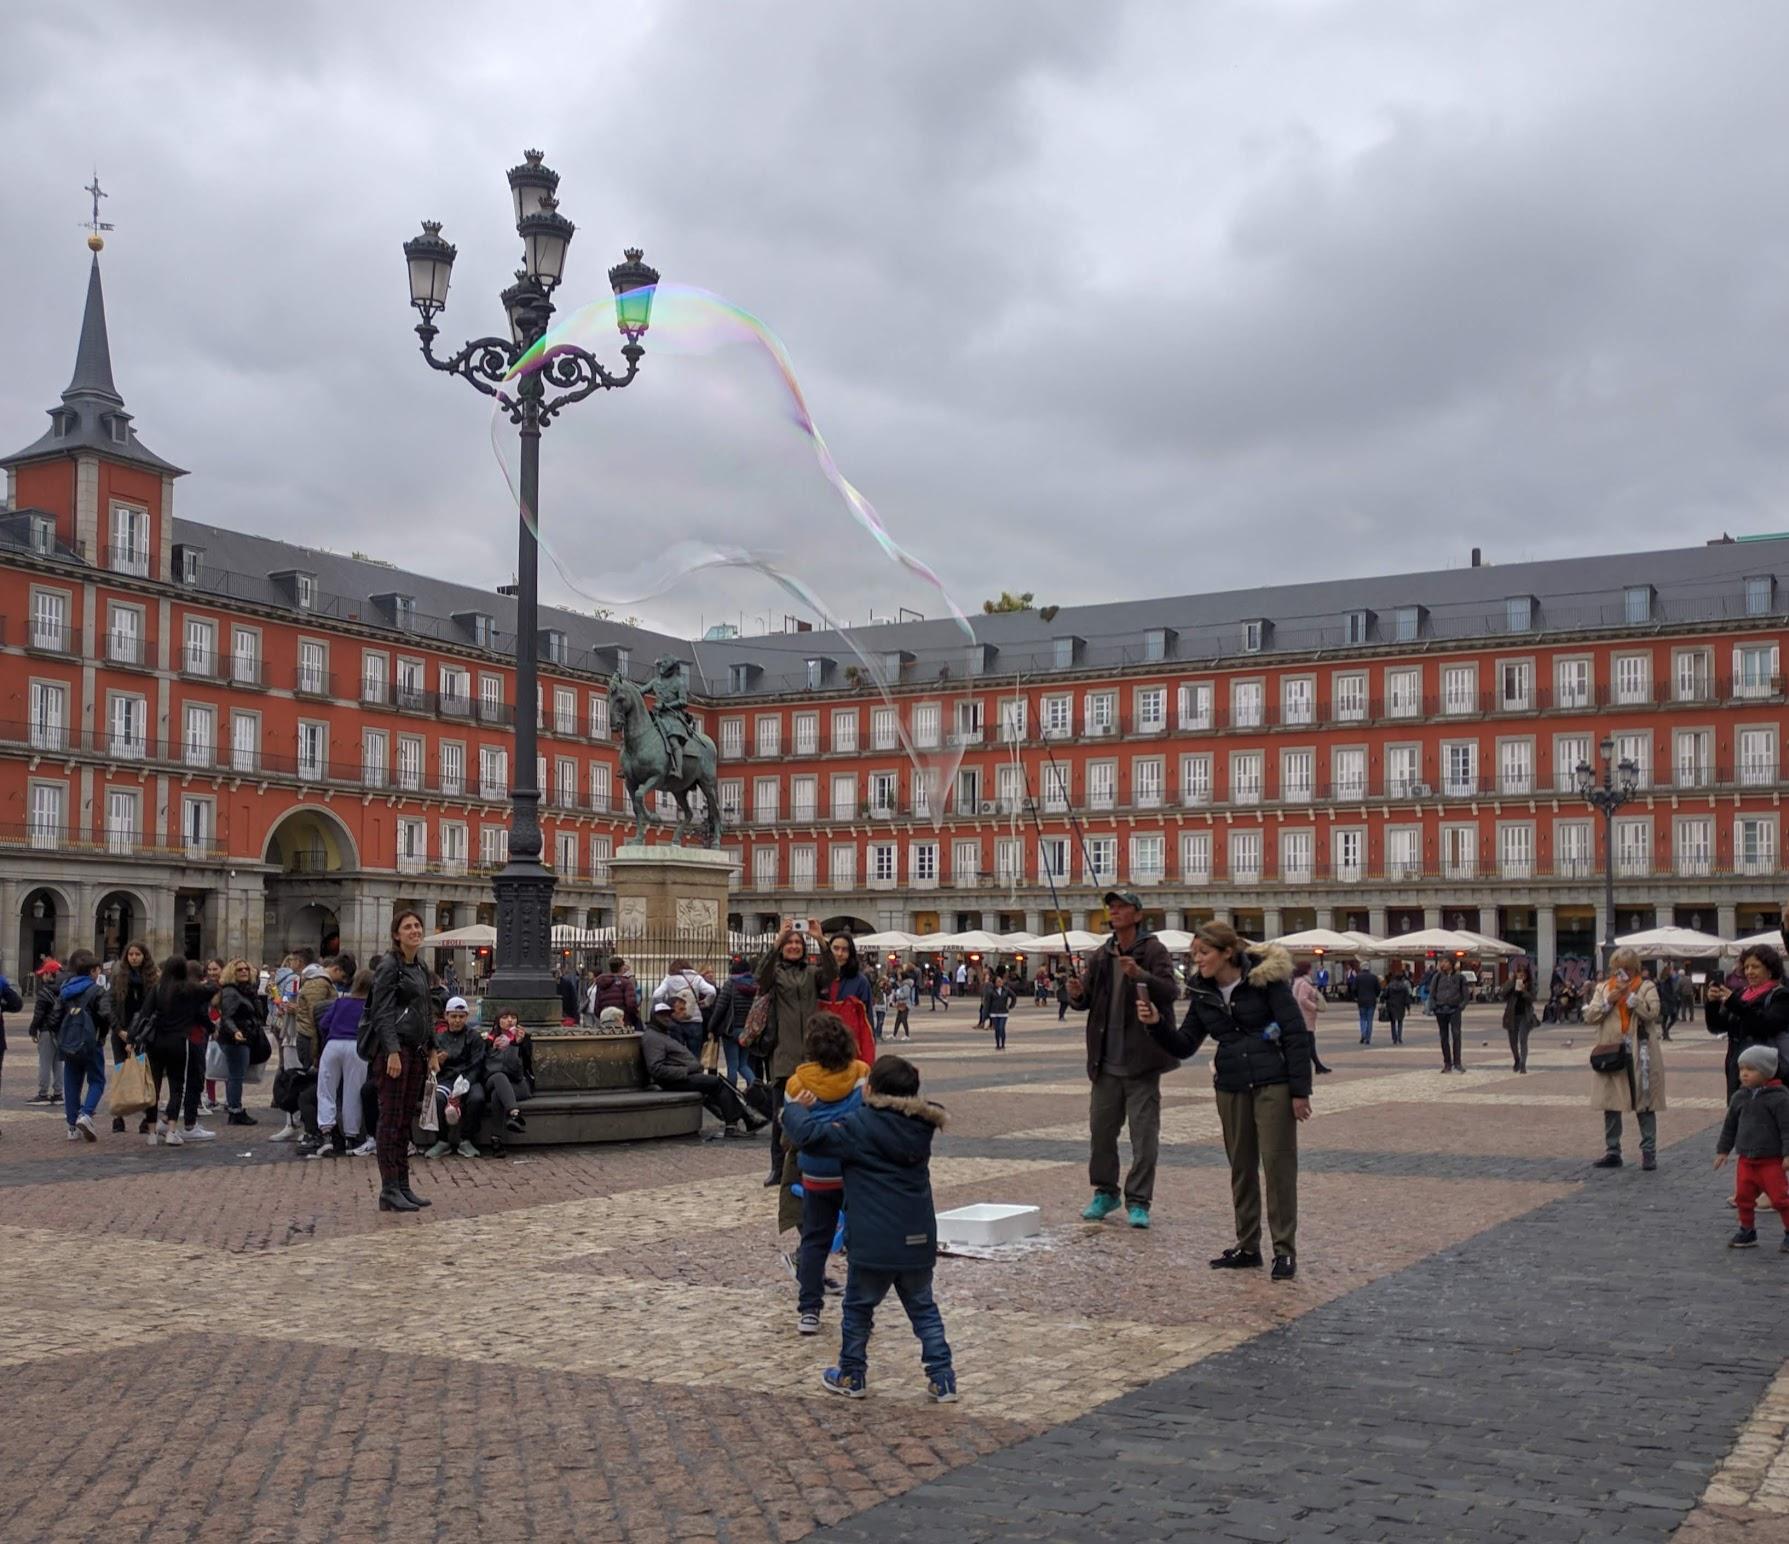 https://madrid.mattrossman.com/img/04/08/plaza-1.jpg not found